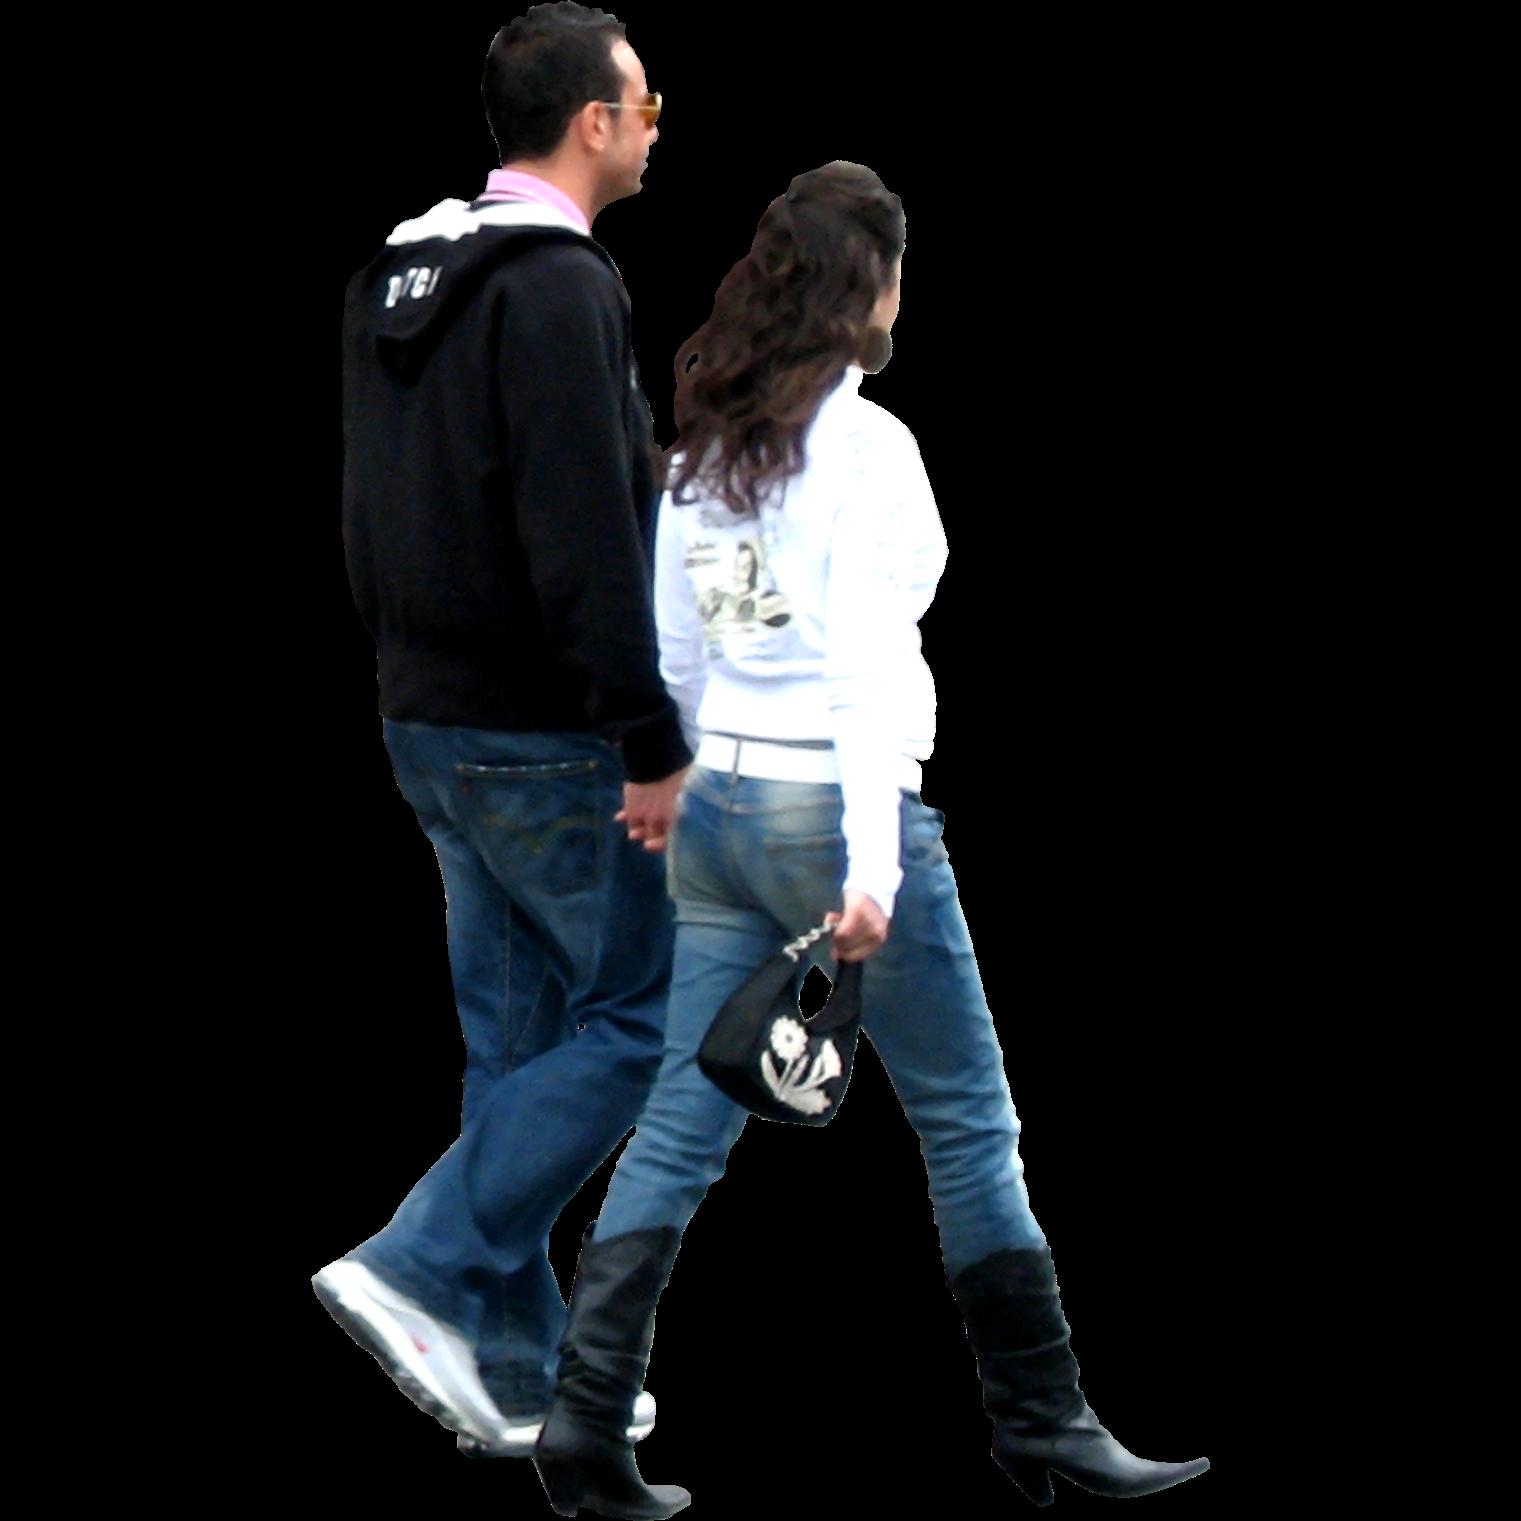 walking away transparent couple clipart architecture photoshop entourage library personas para render immediate